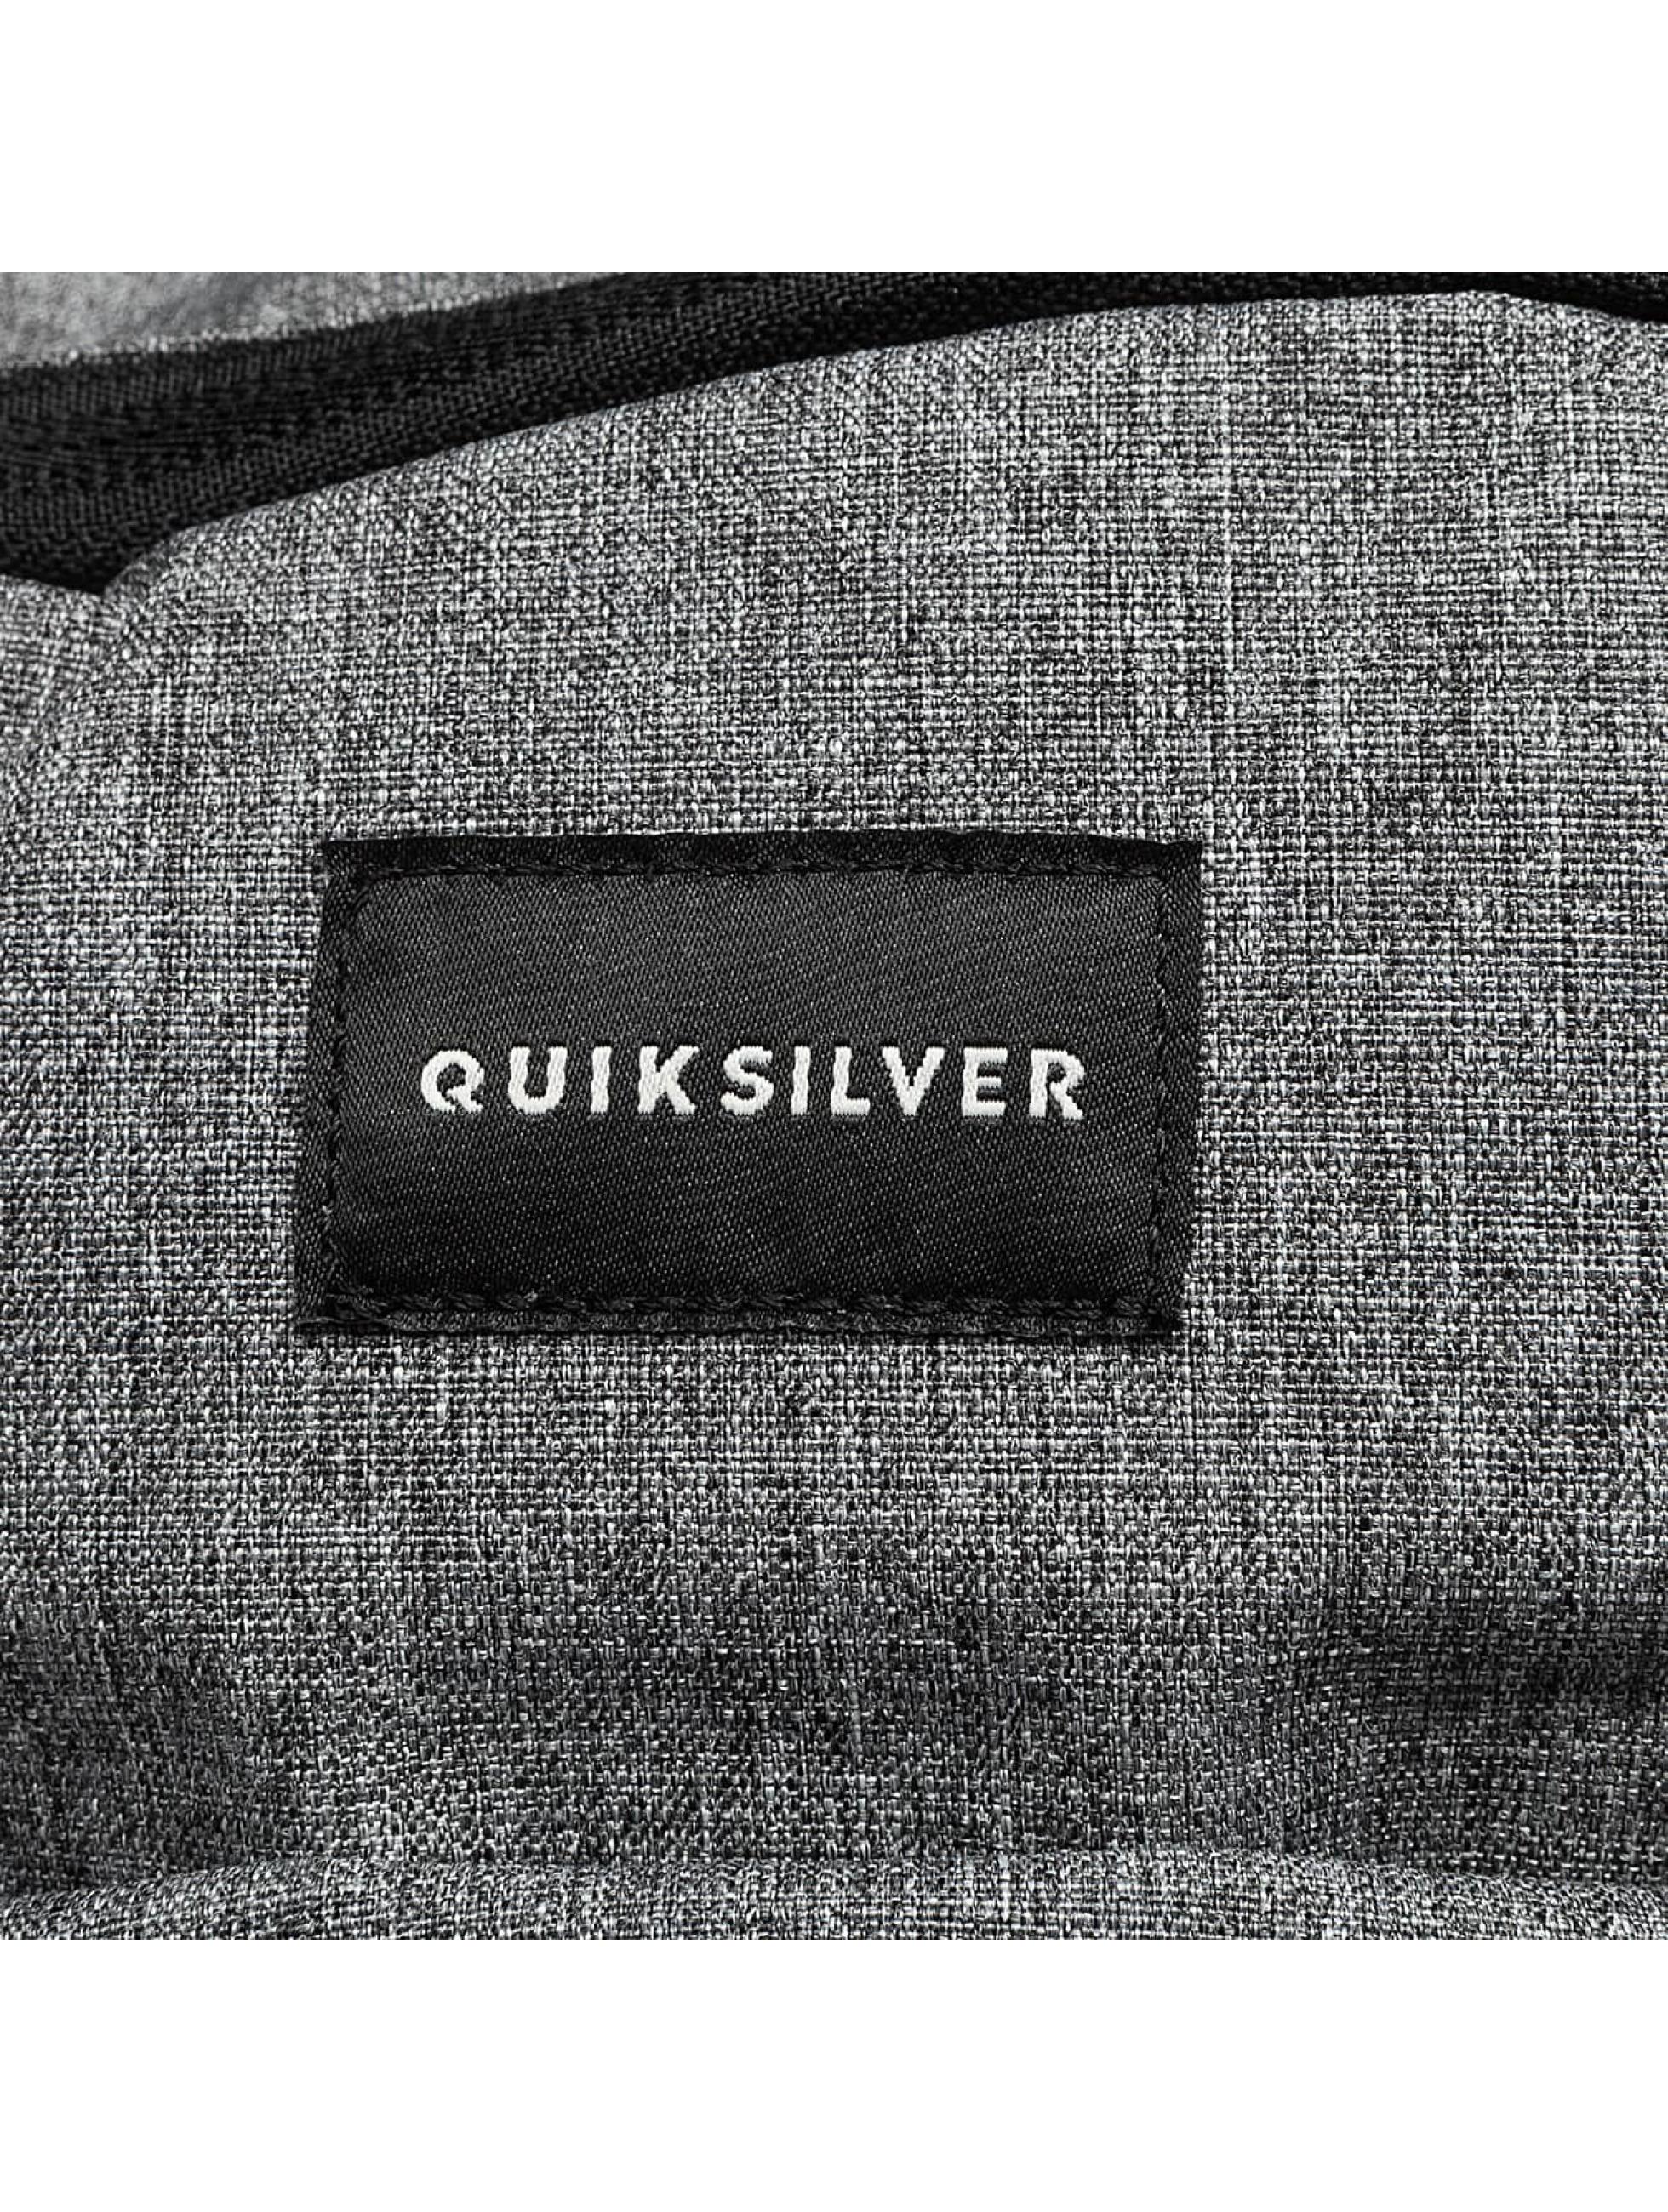 Quiksilver Rygsæk Burst grå